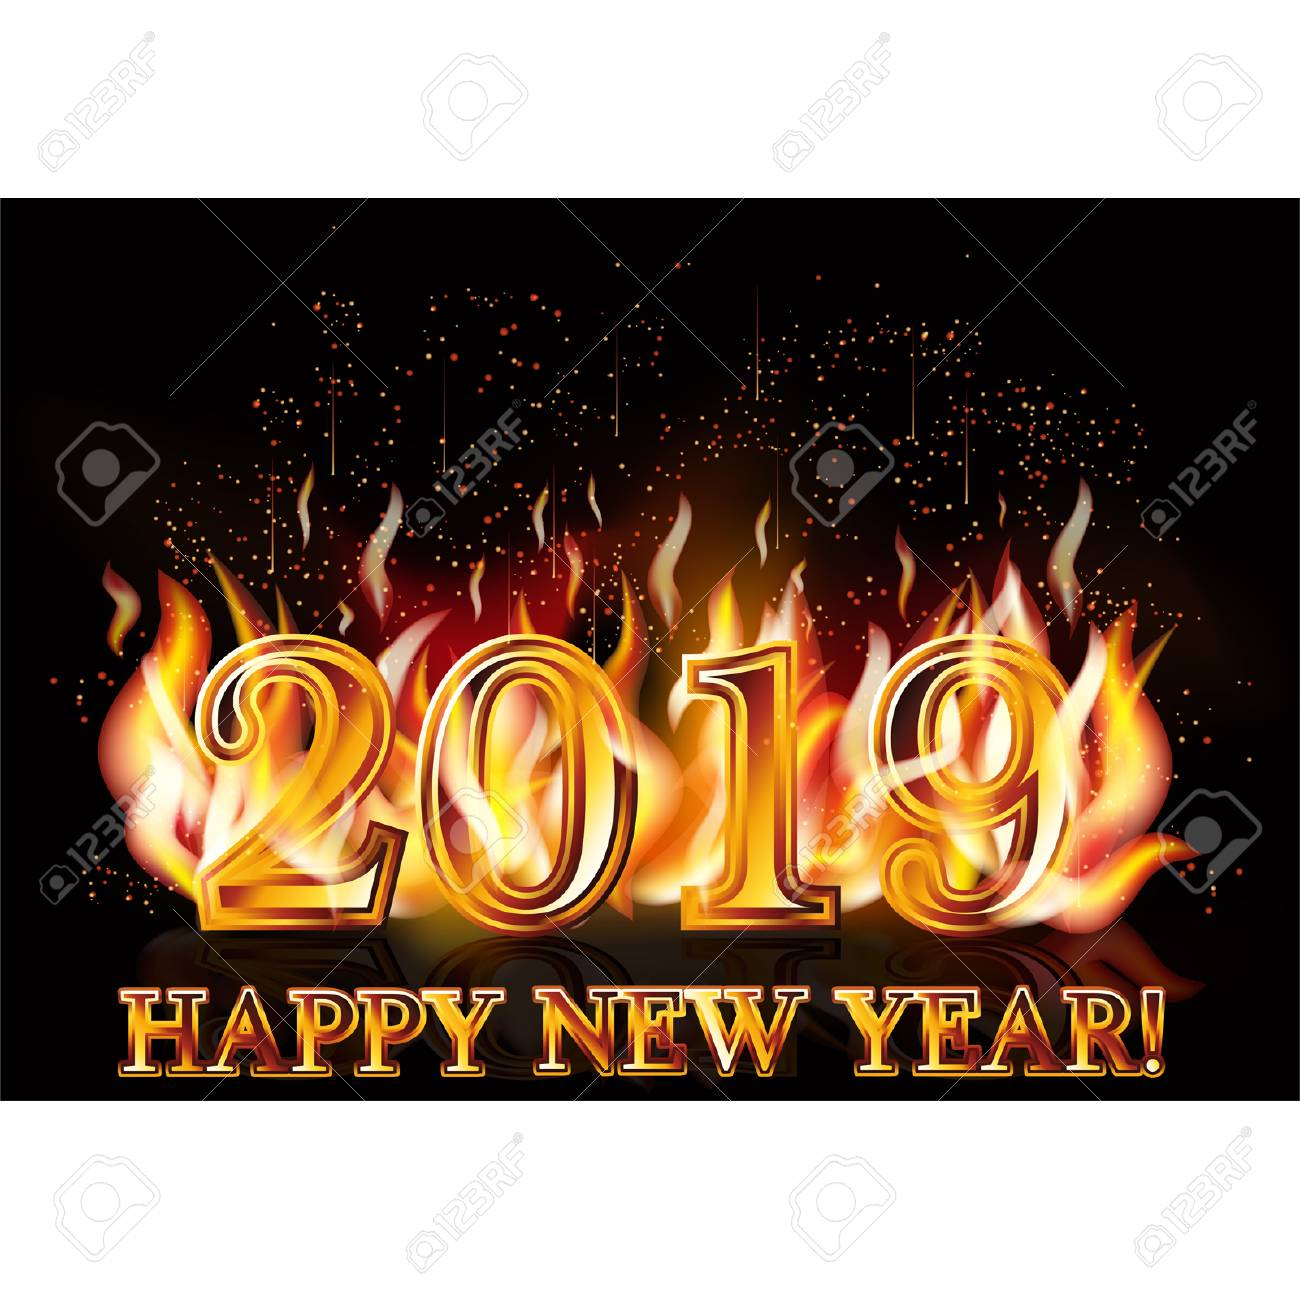 Happy New Year 2019 Fire Wallpaper Stock Vector   107488894